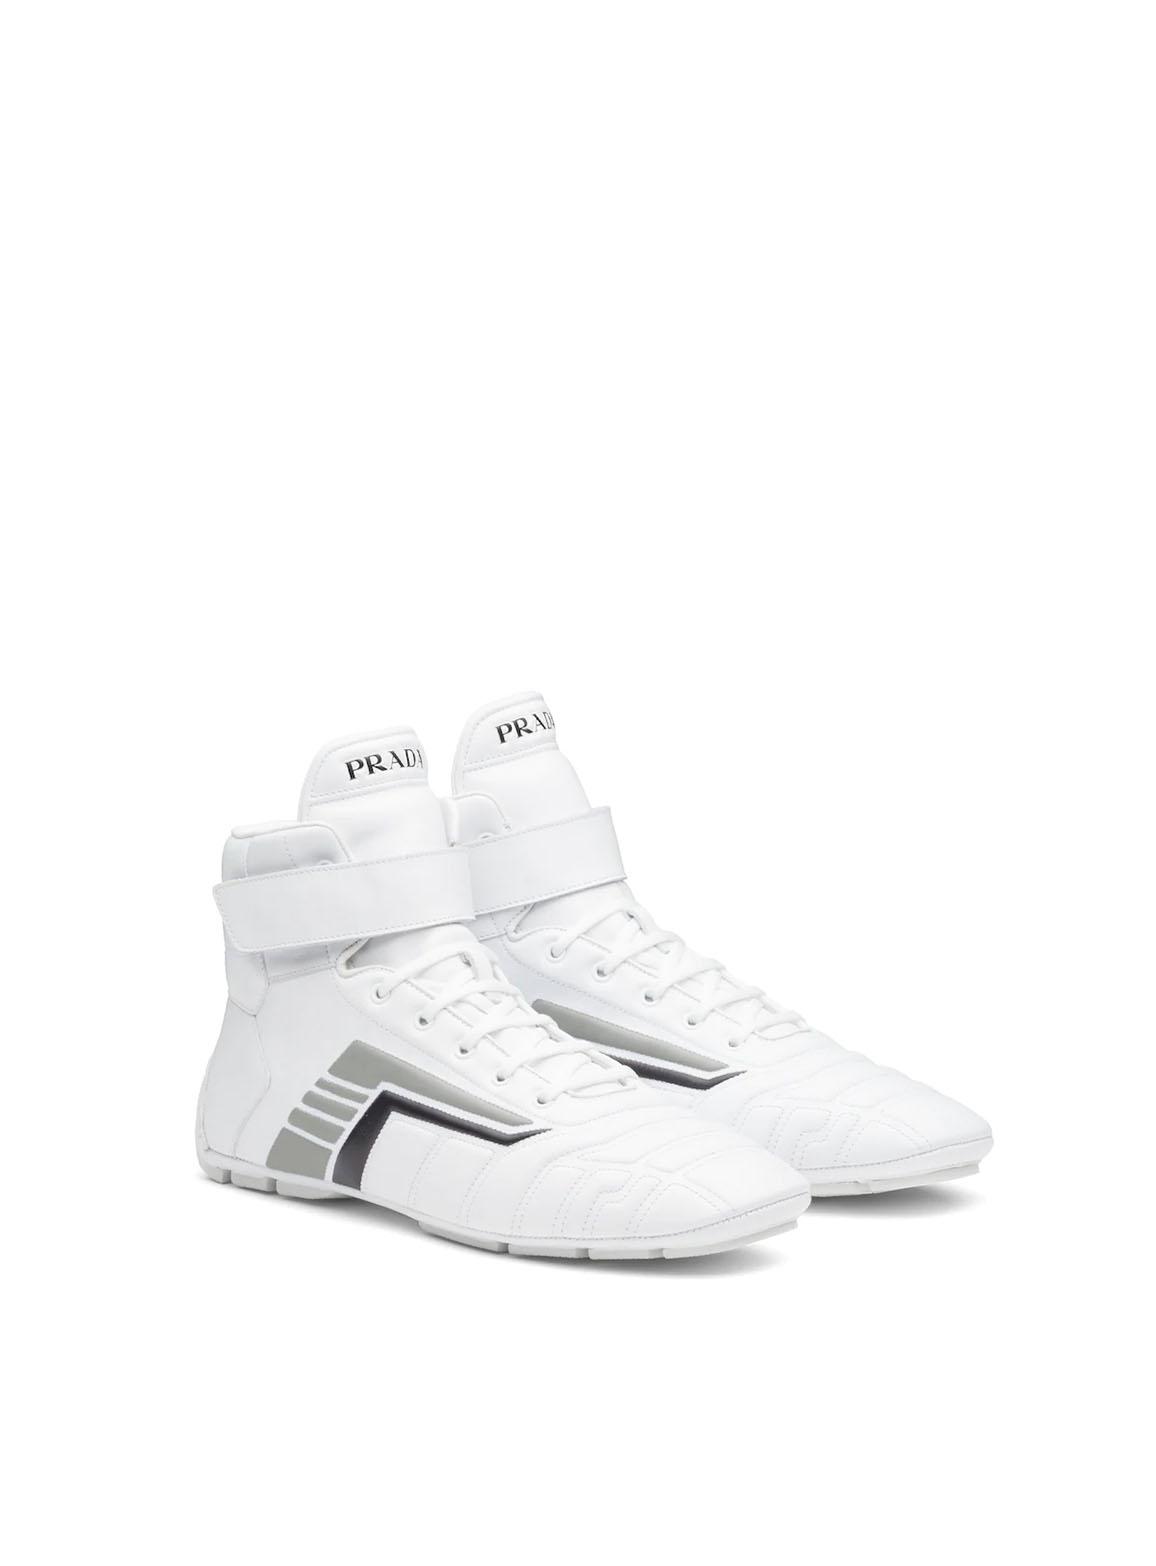 Prada Rev leather high-top sneakers